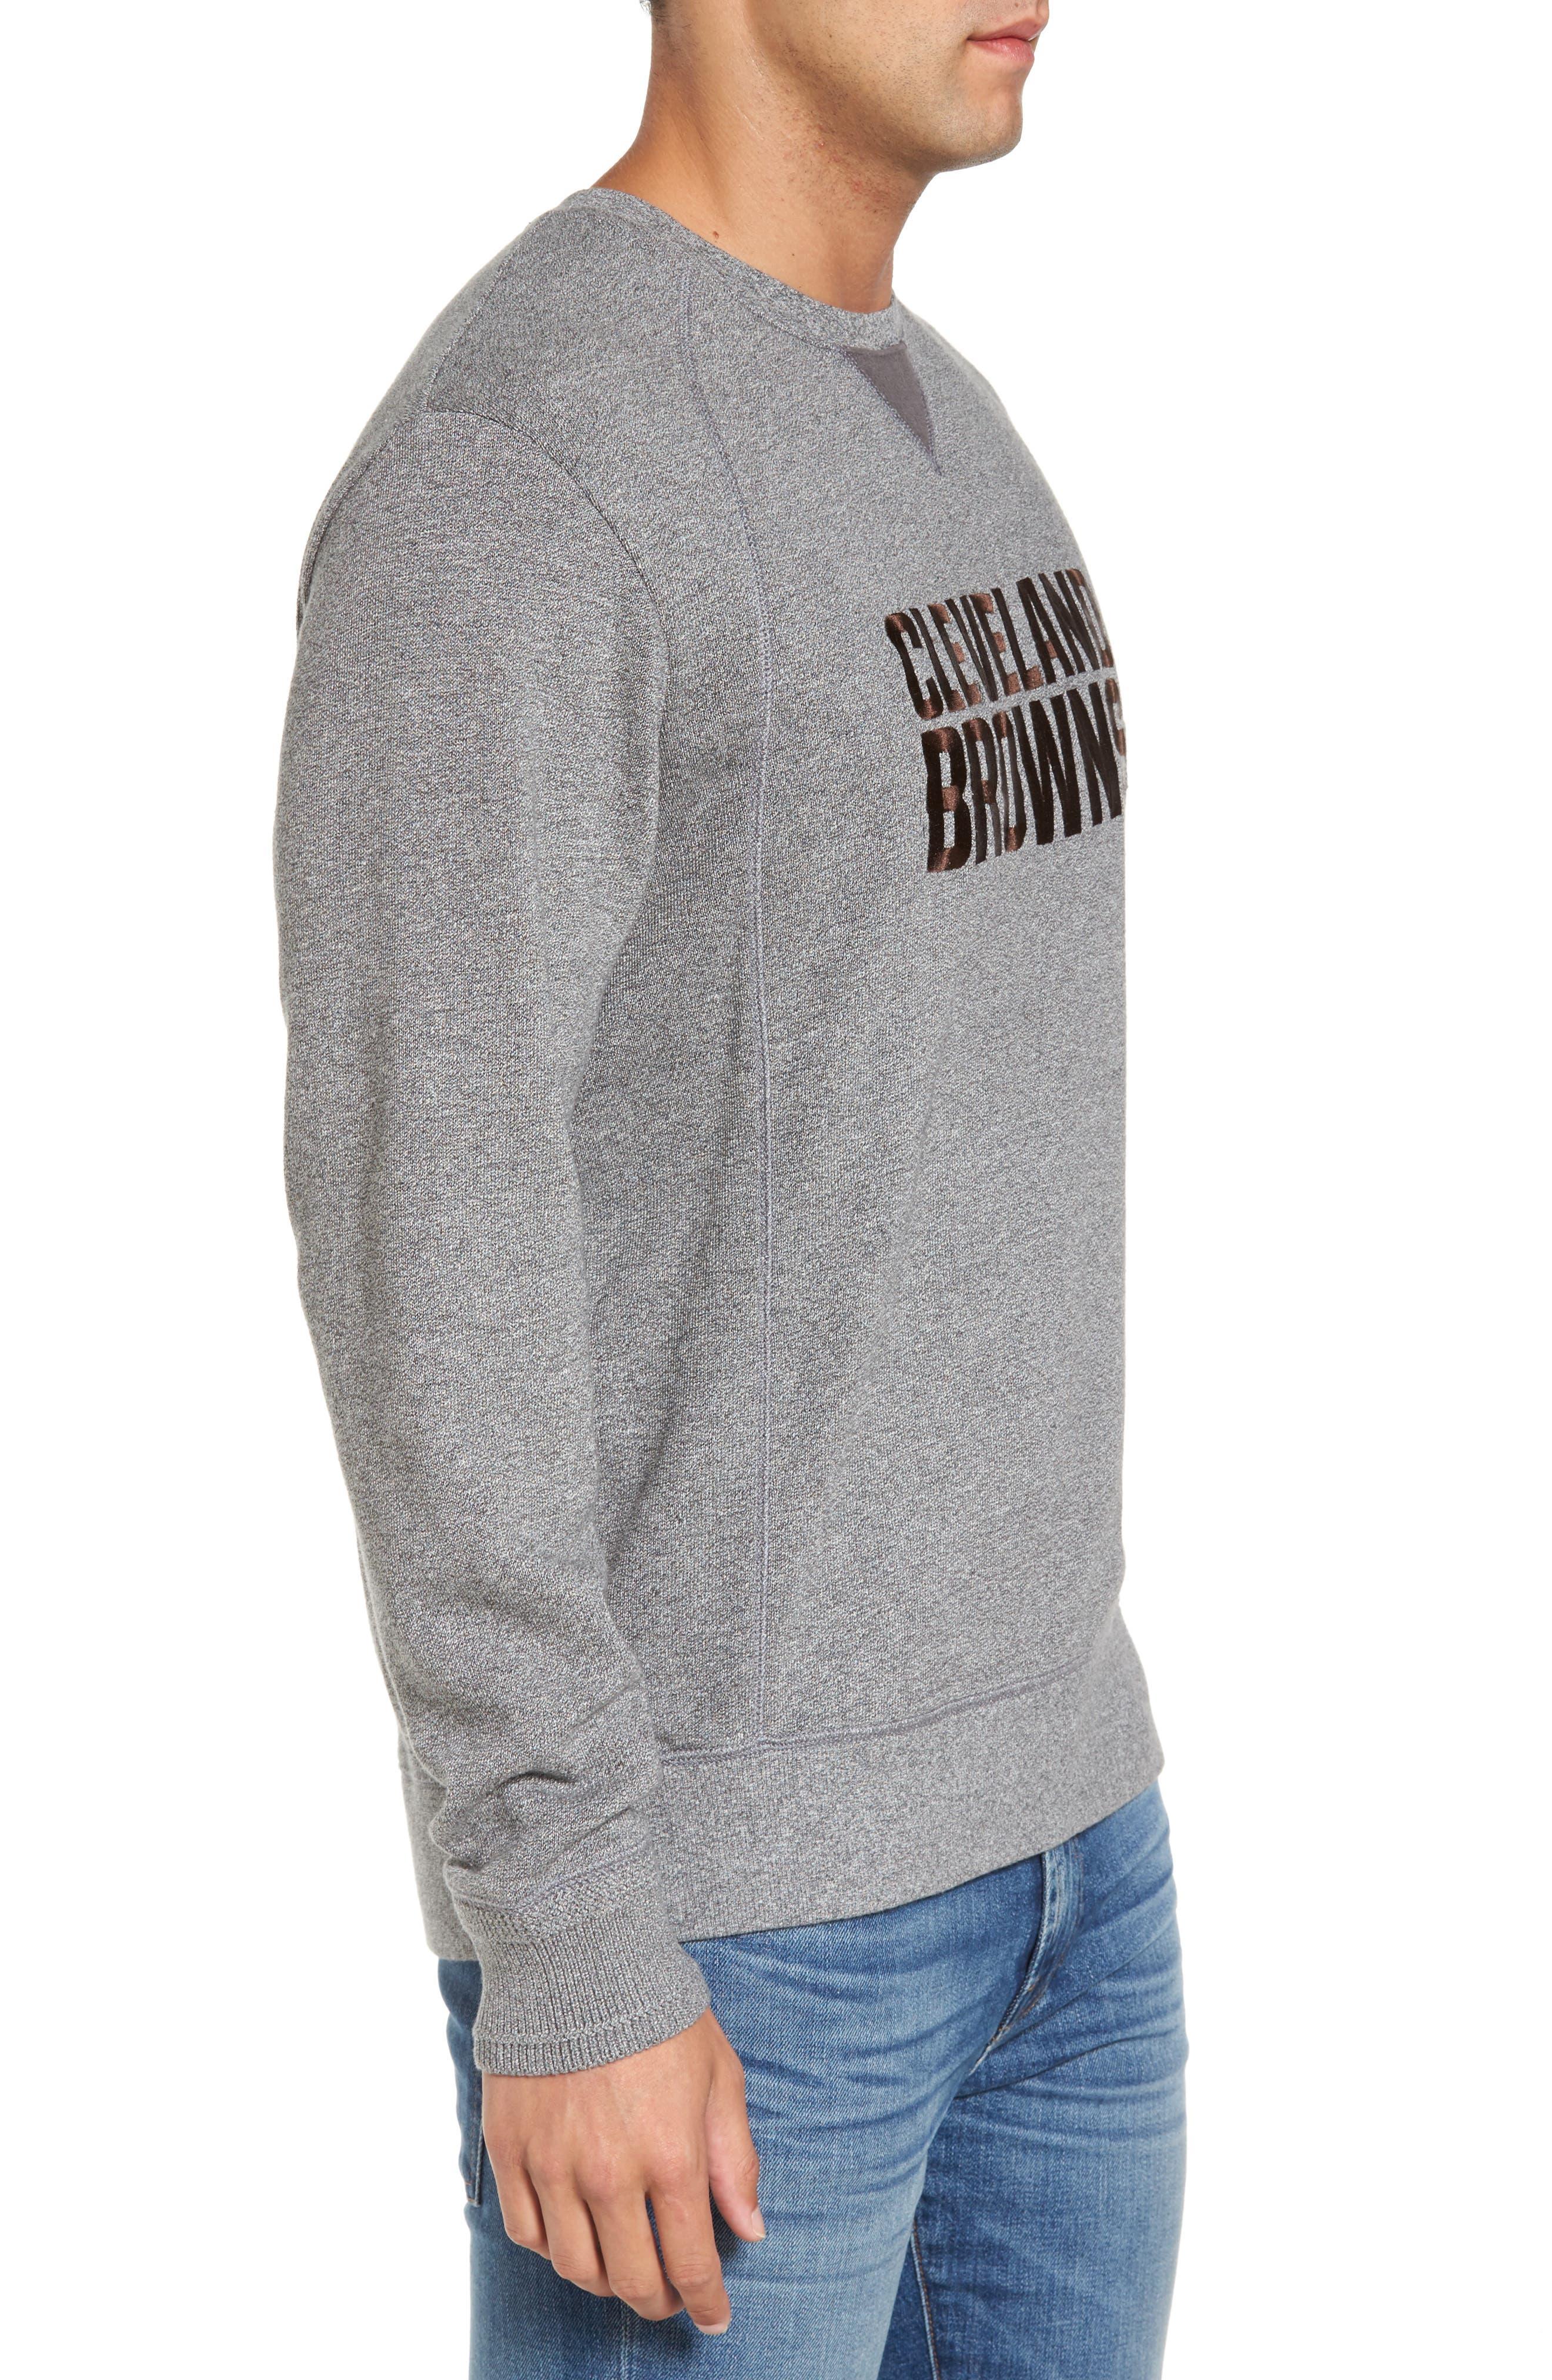 NFL Stitch of Liberty Embroidered Crewneck Sweatshirt,                             Alternate thumbnail 69, color,